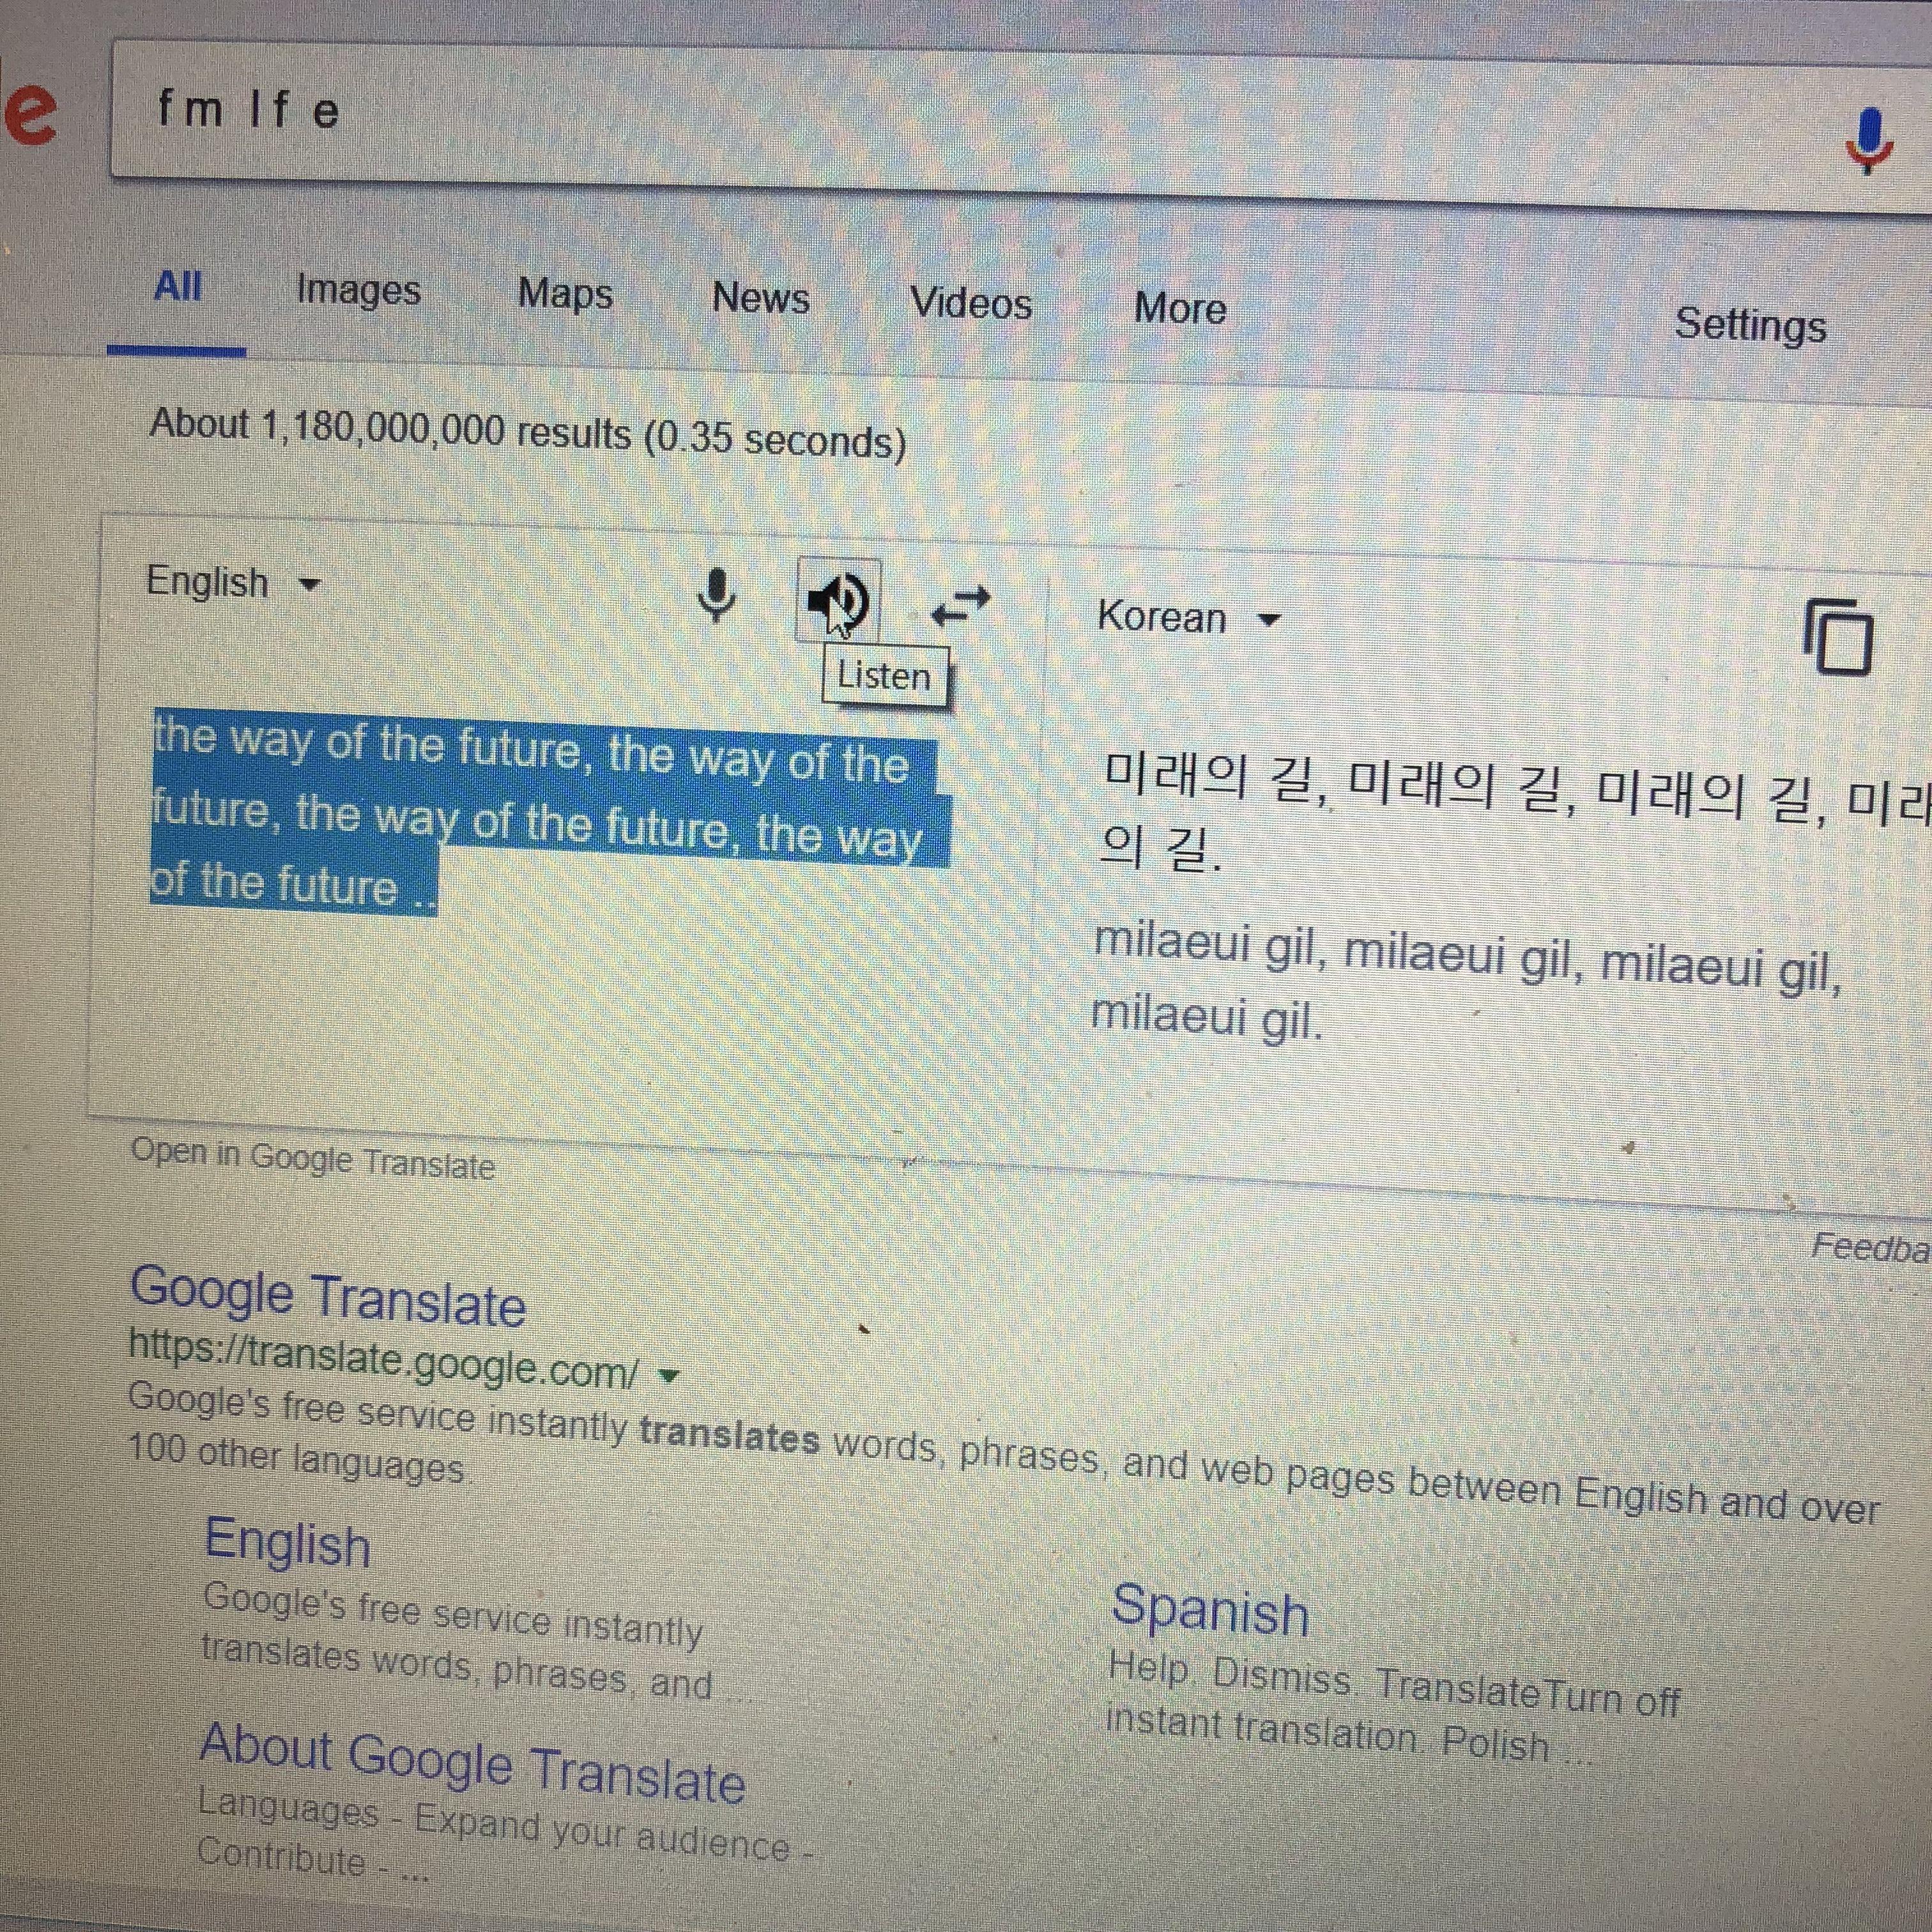 Vamos A Comer Juntos Palabras Coreanas Frases Coreanas